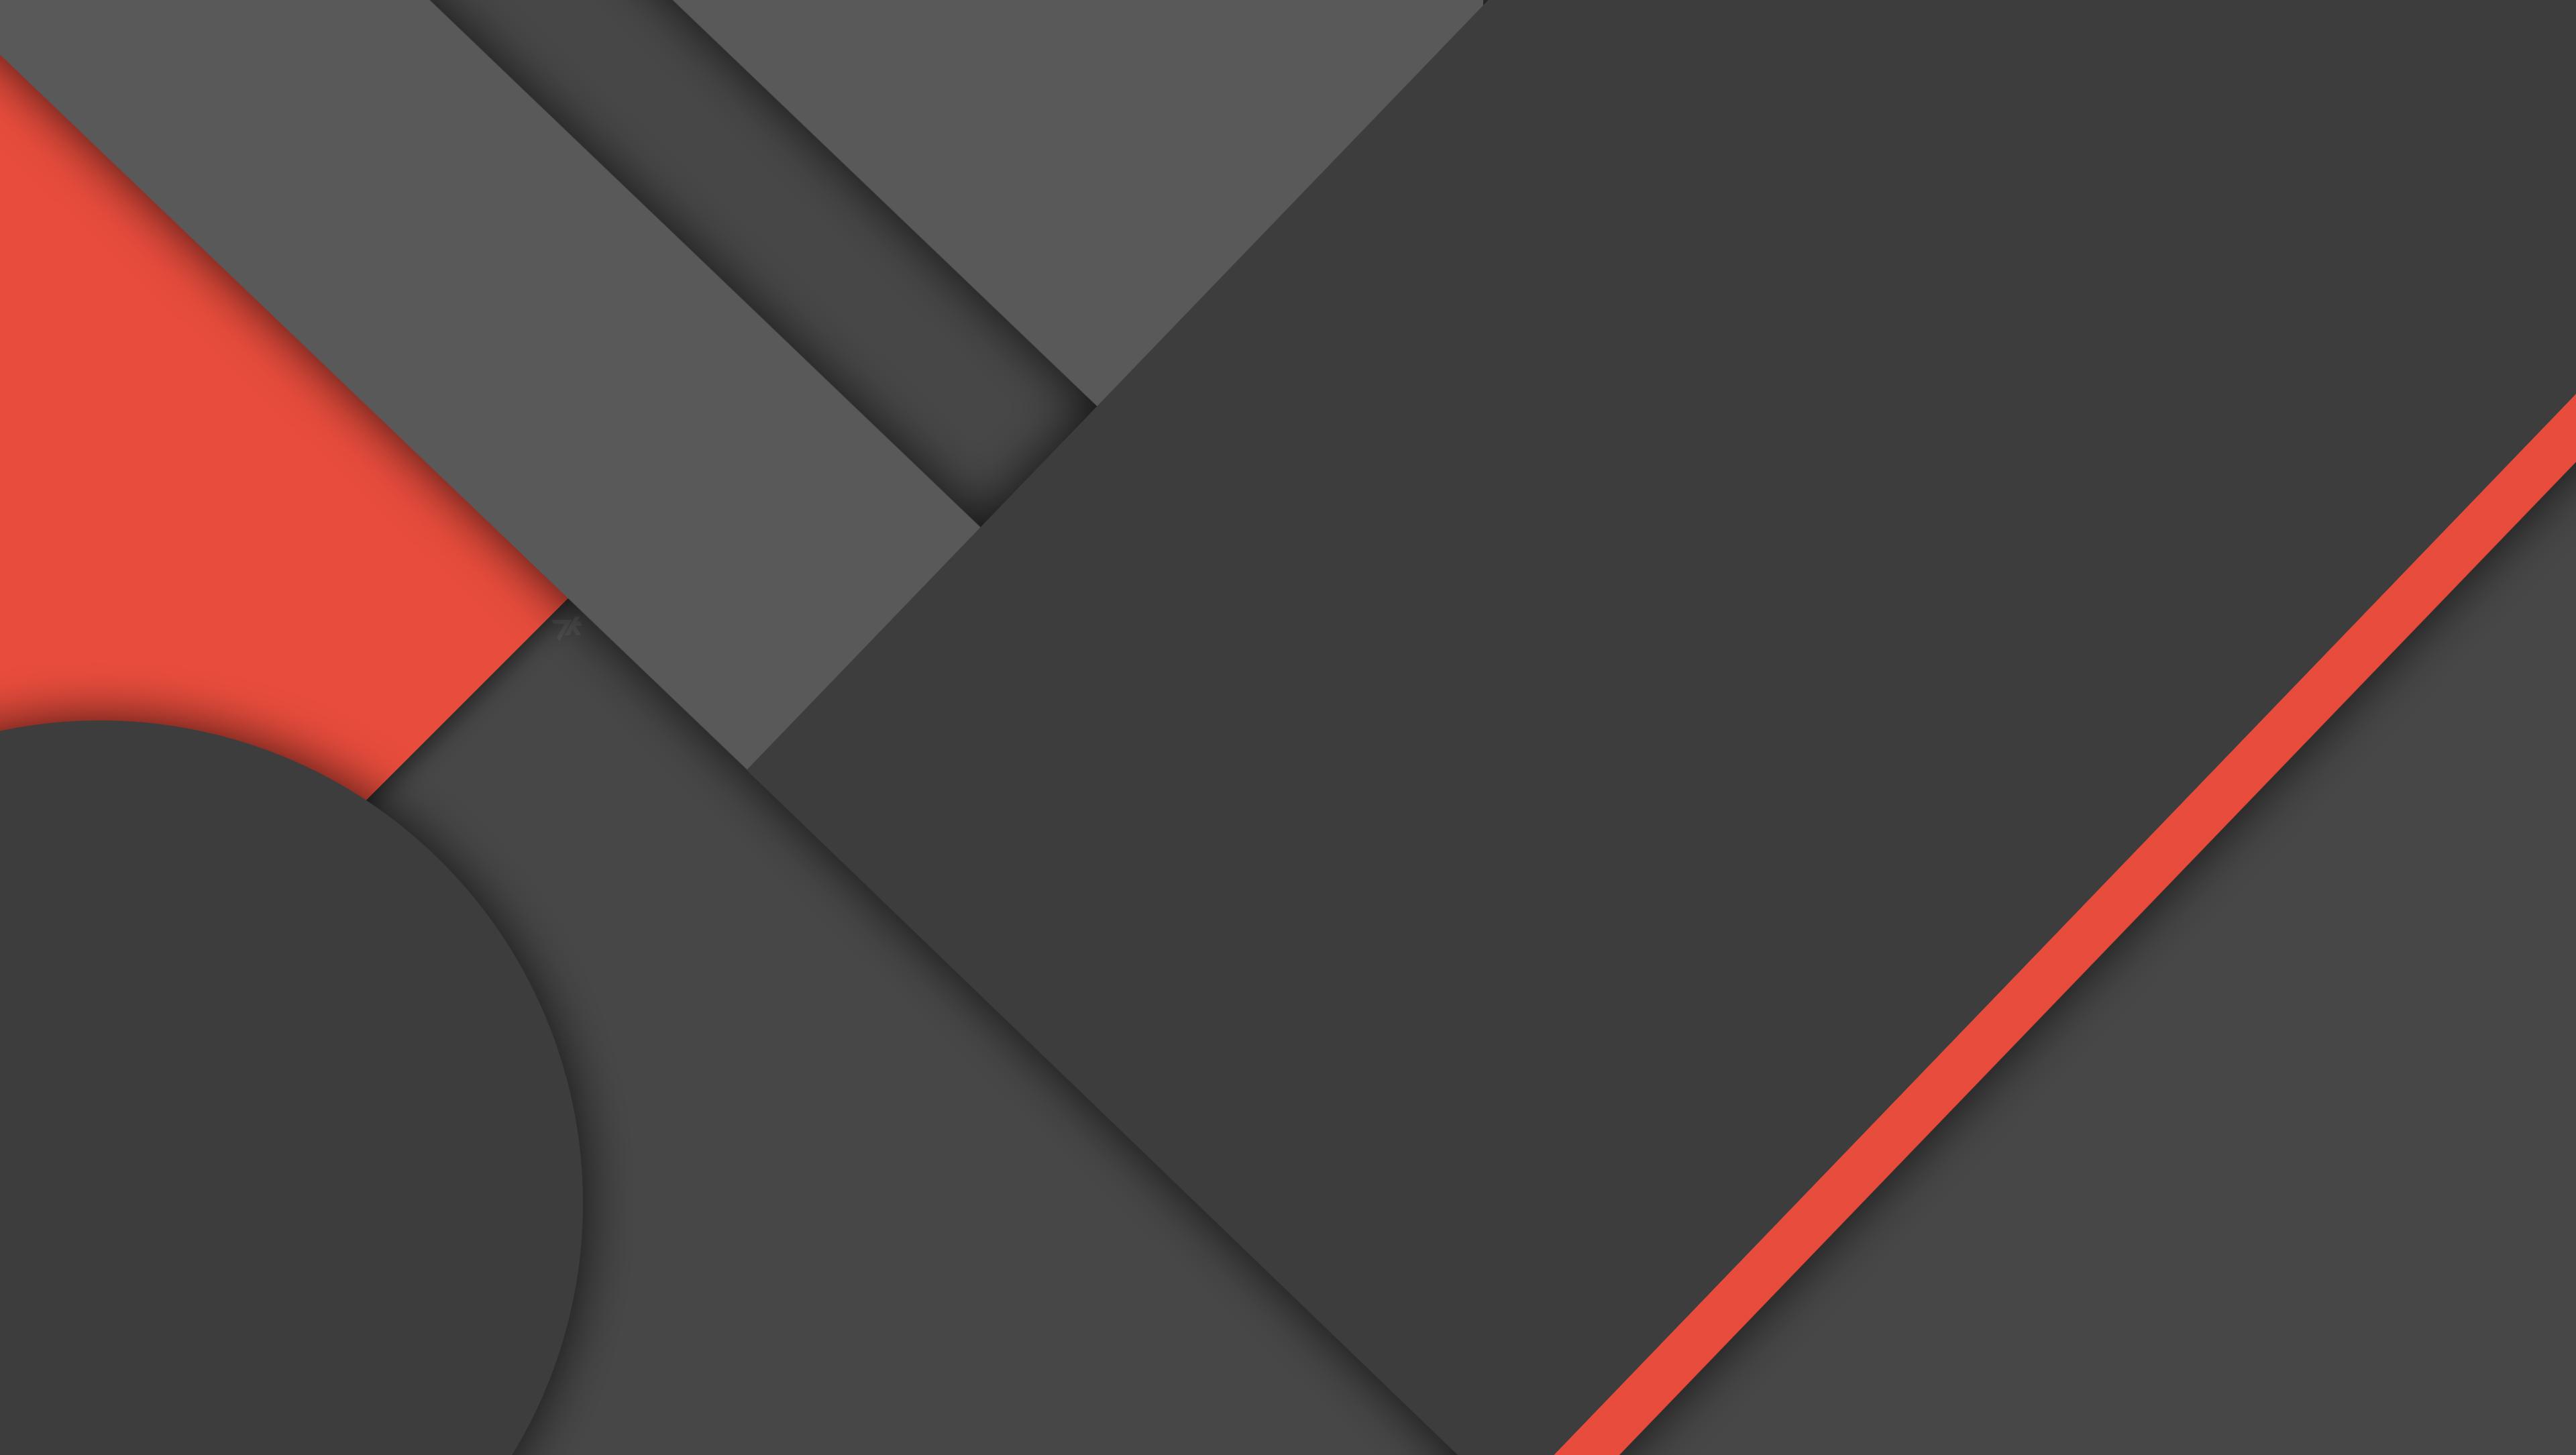 40 Best Material Design Wallpapers 4K 2016 HD Windows 7 8 10 3840x2169